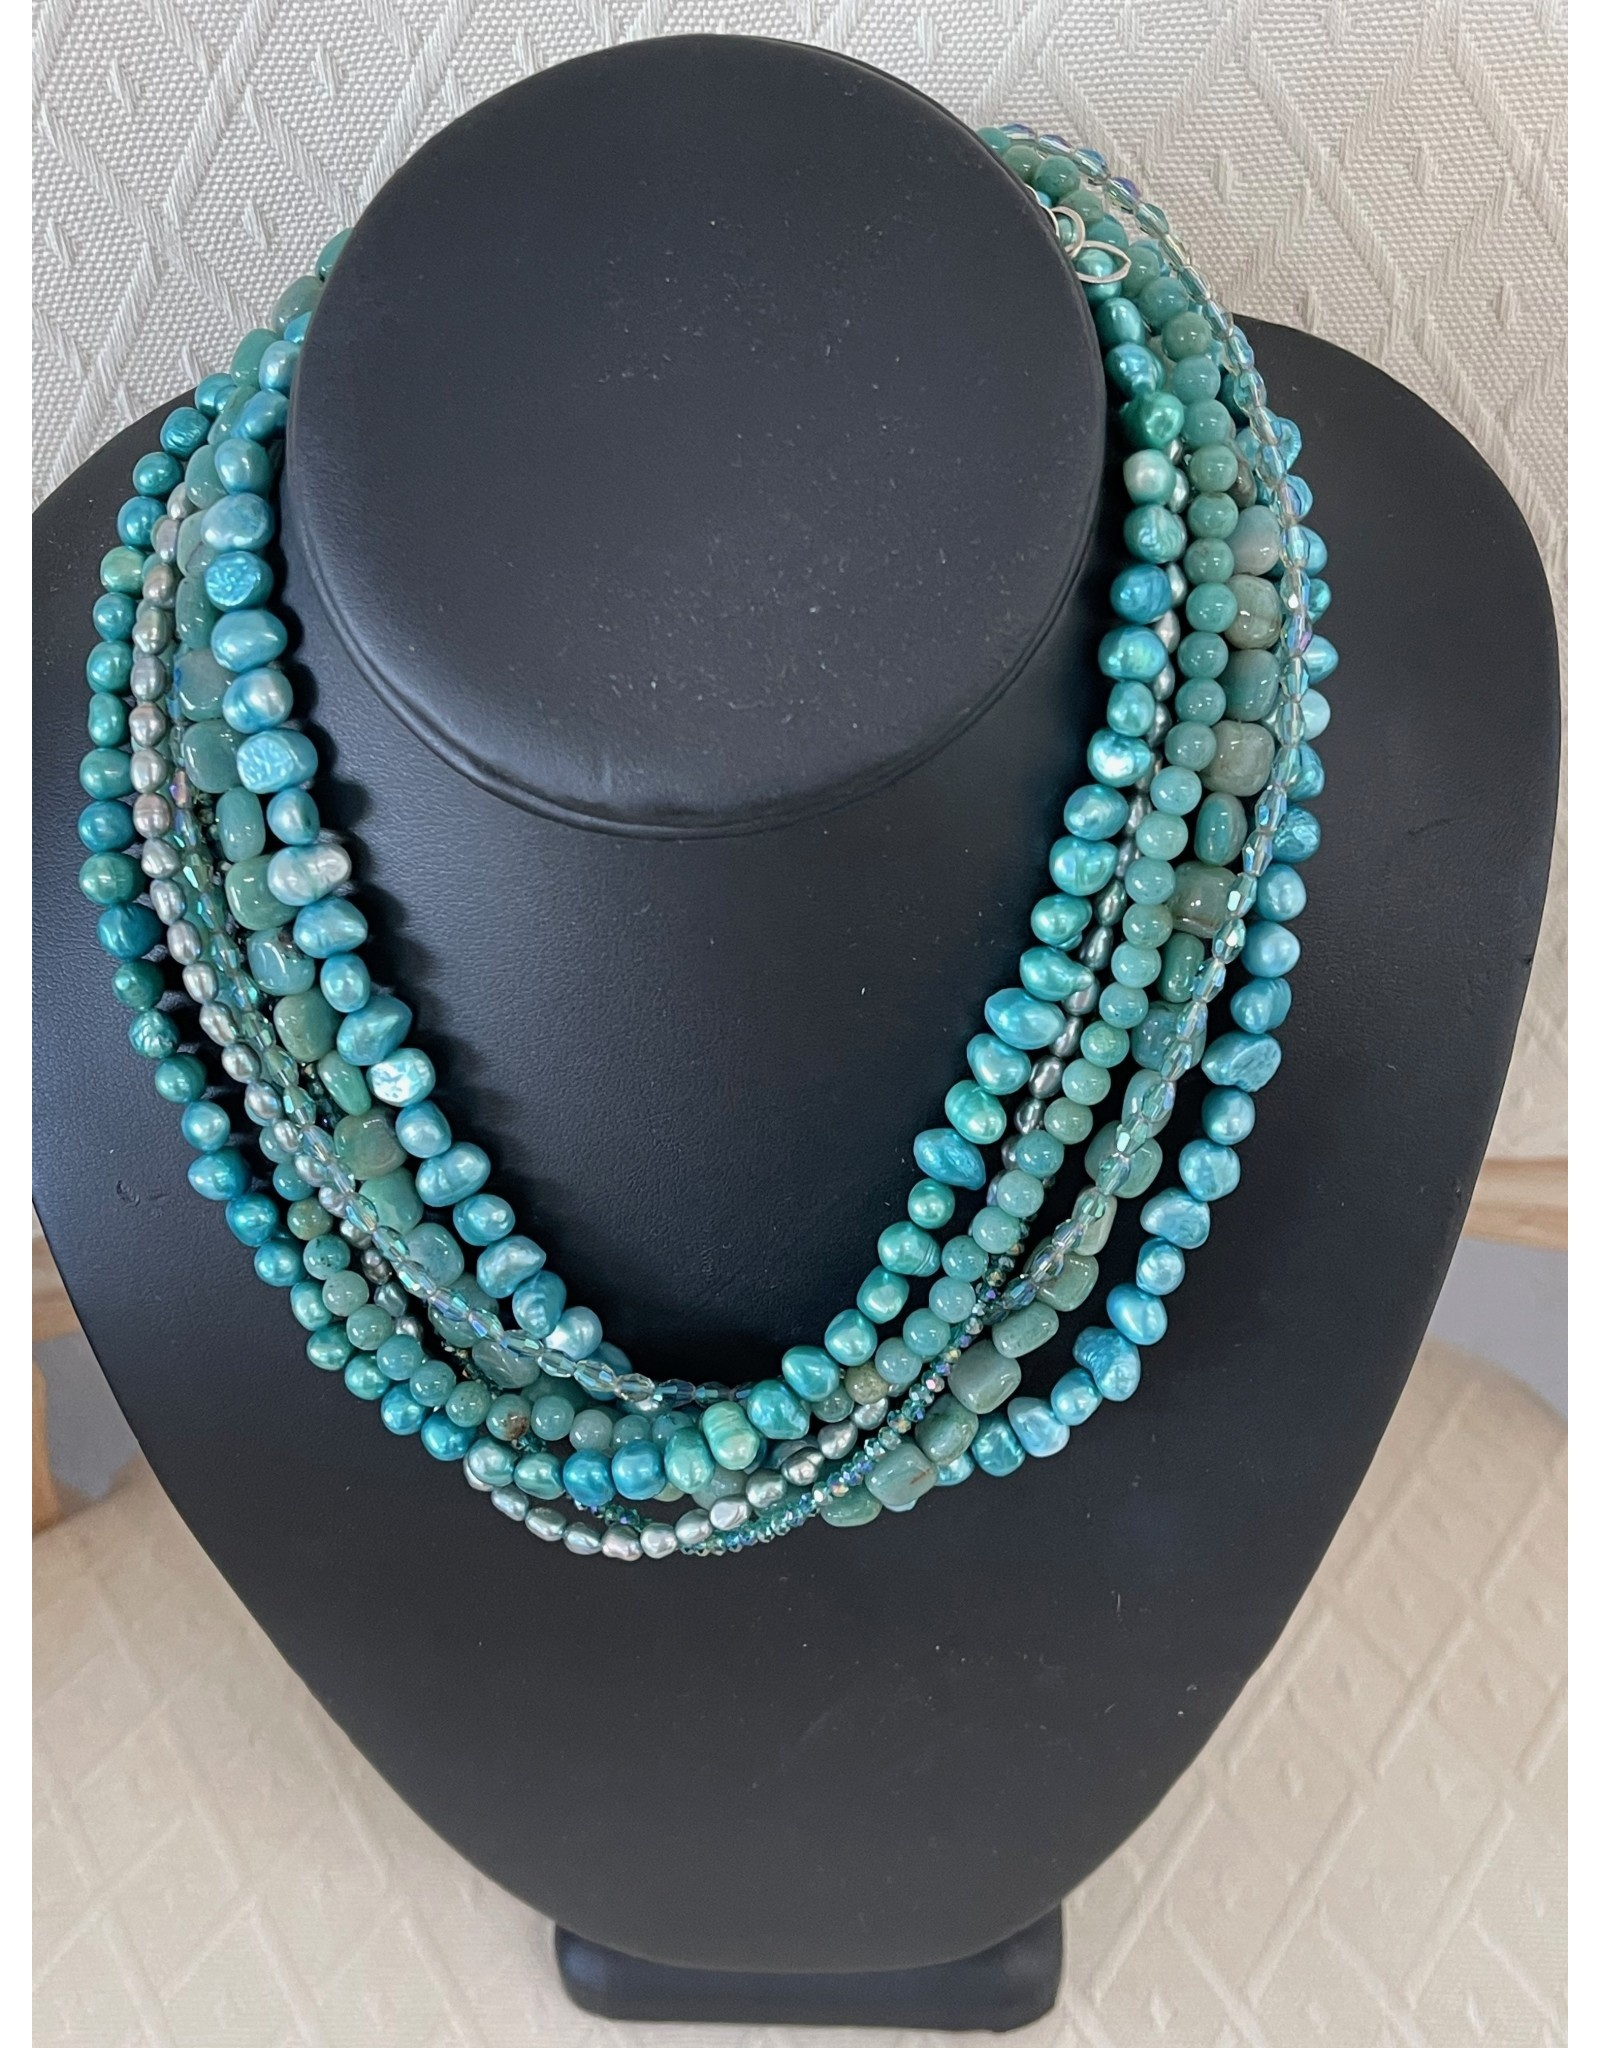 "Rare Finds NECKLACE, Amazonite, pearls, Swarovski crystals, sterling, 7 strand, 16"" RARE"